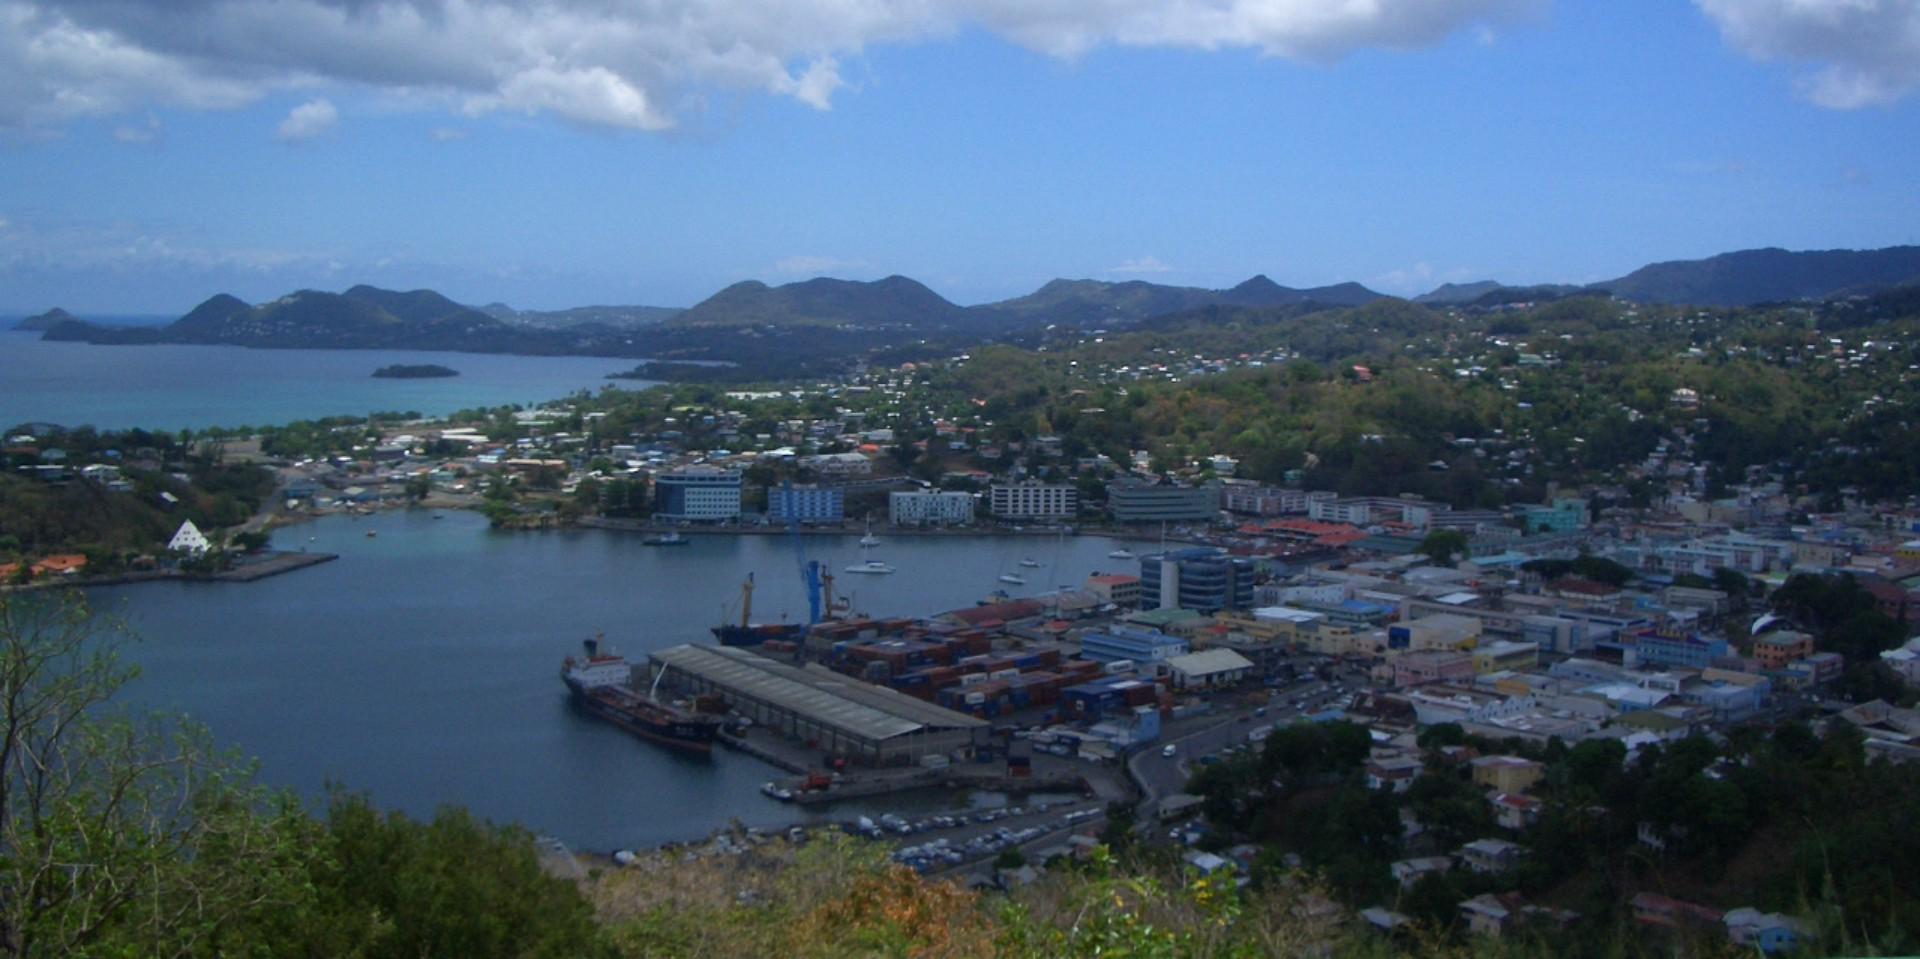 Saint Lucia Population in 2017